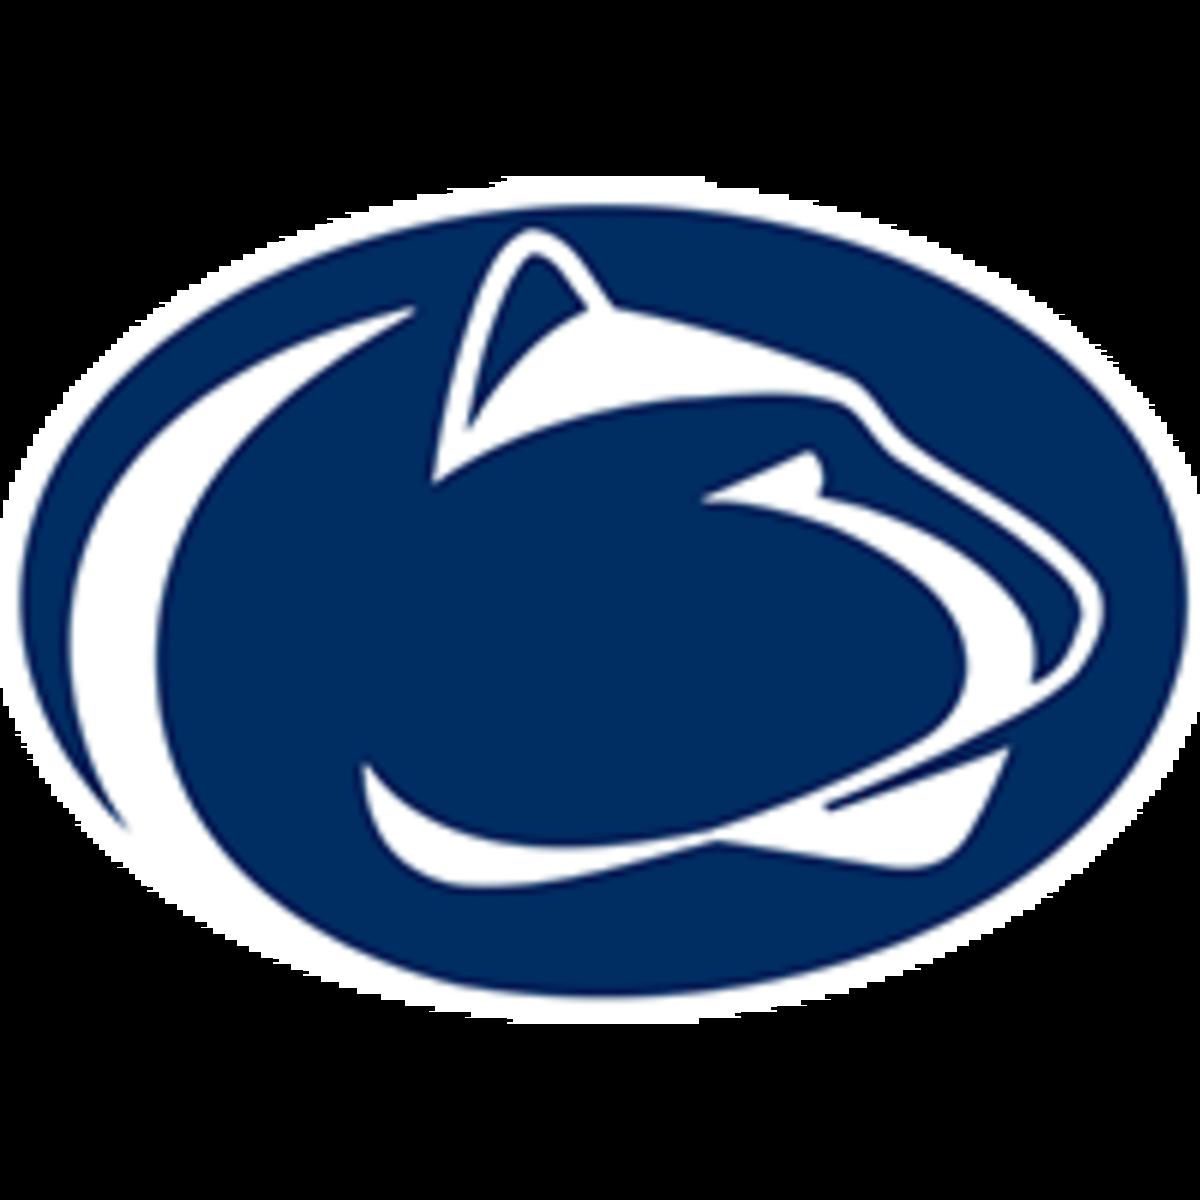 College Football Top 25 Rankings: Penn State